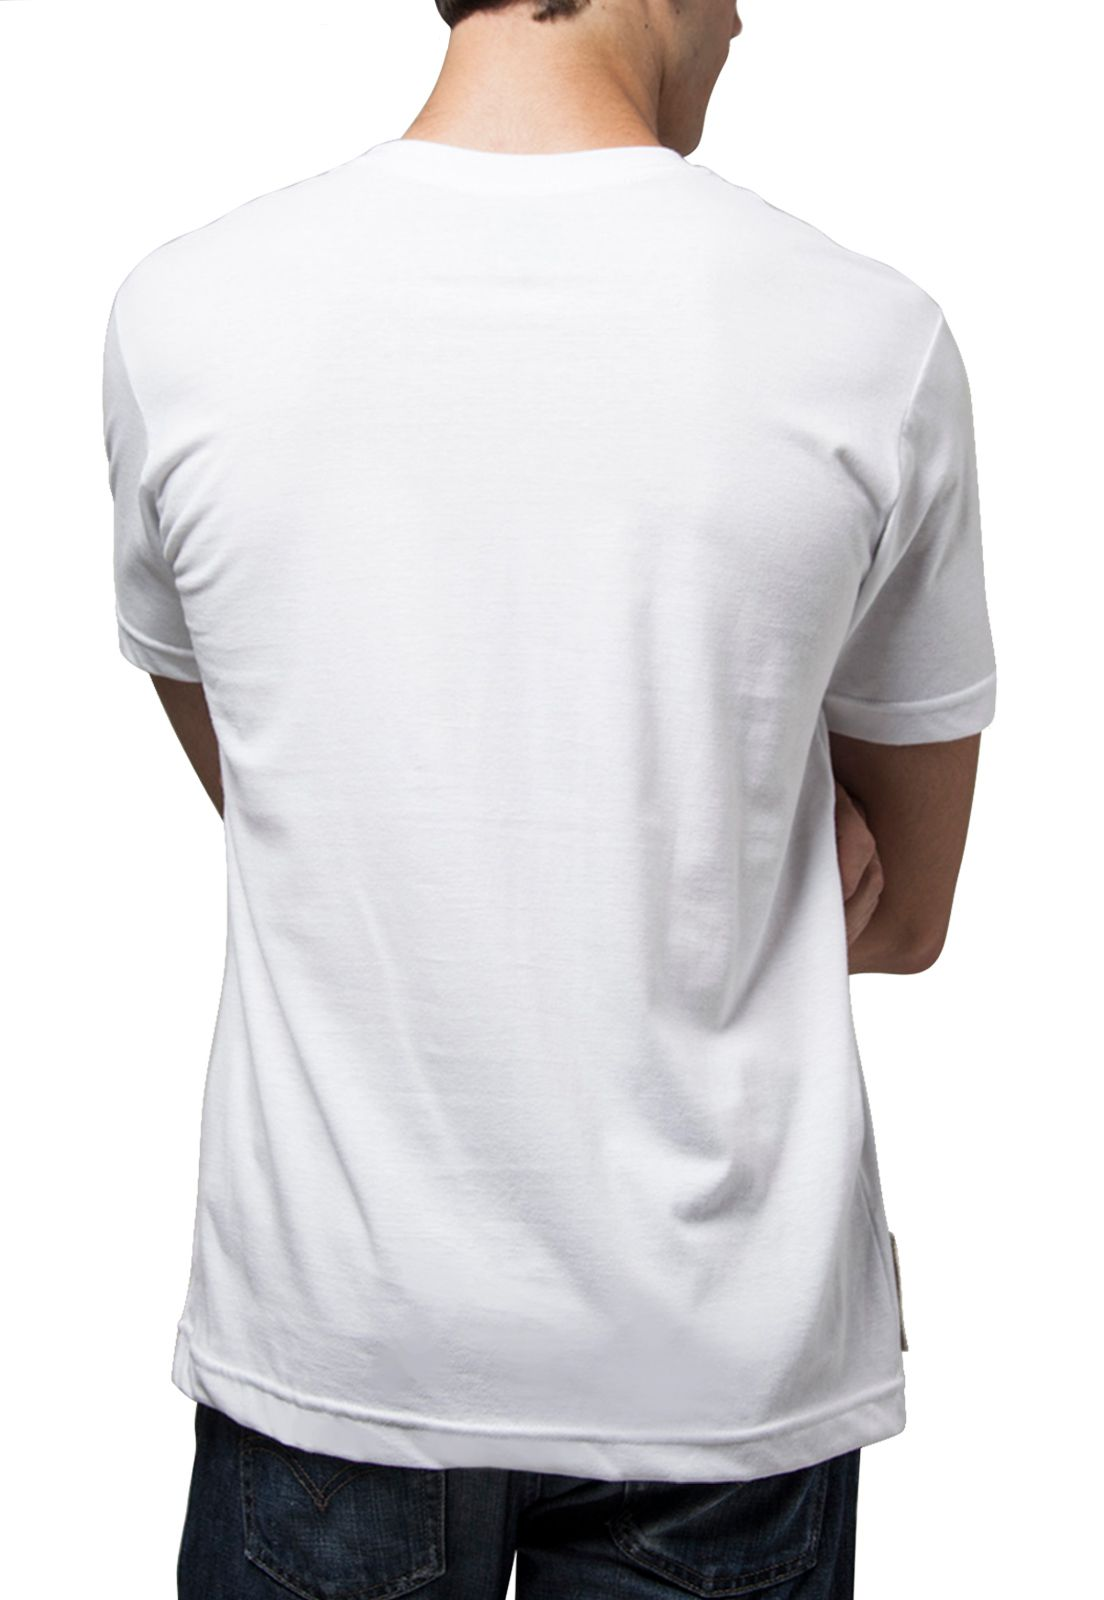 Camiseta Amazônia Eletrocardio - Branco